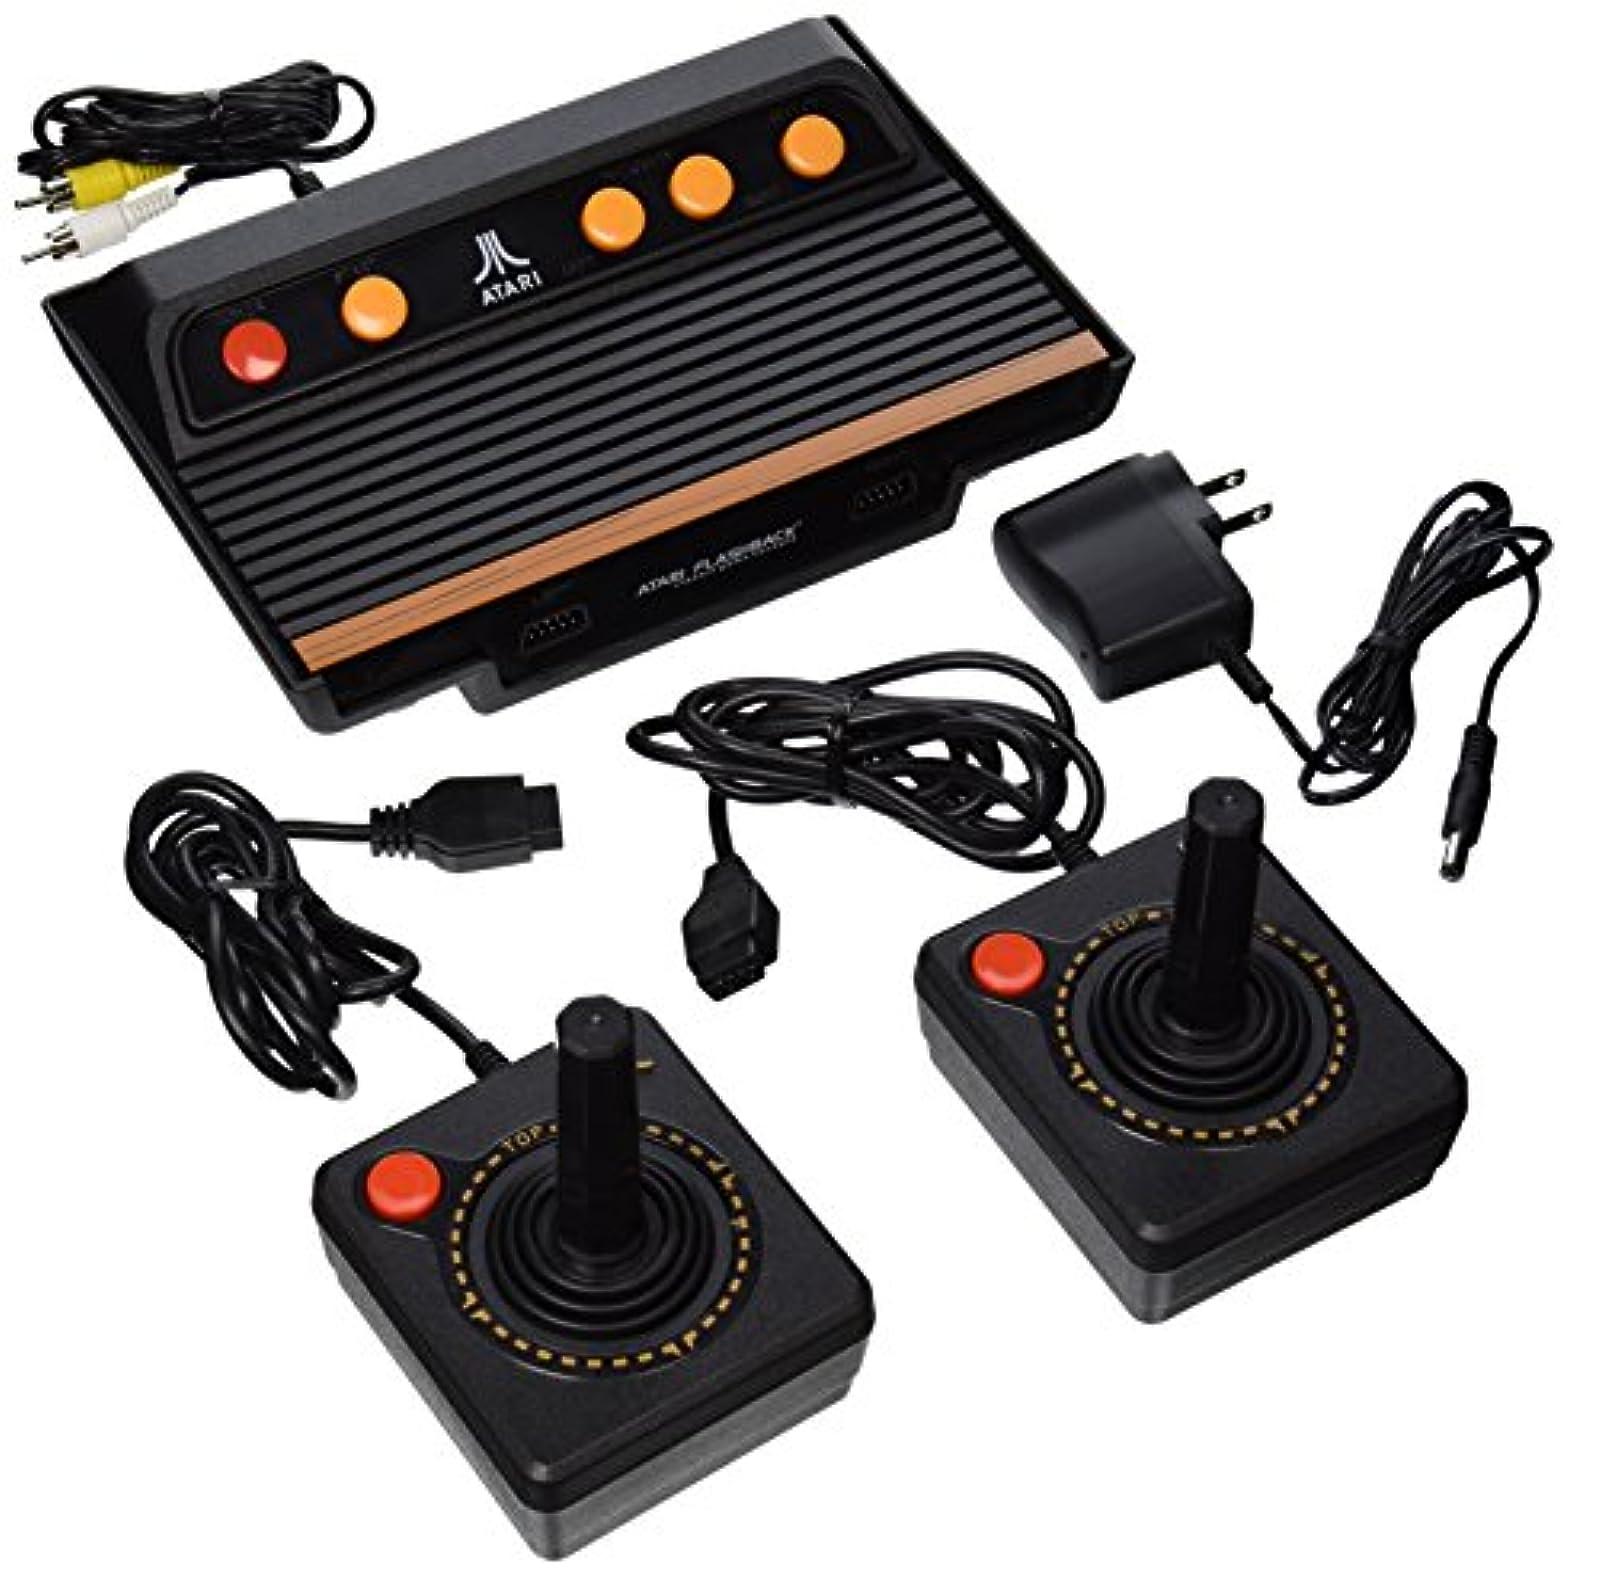 Atari Atgames Flashback 5 Classic Game Console